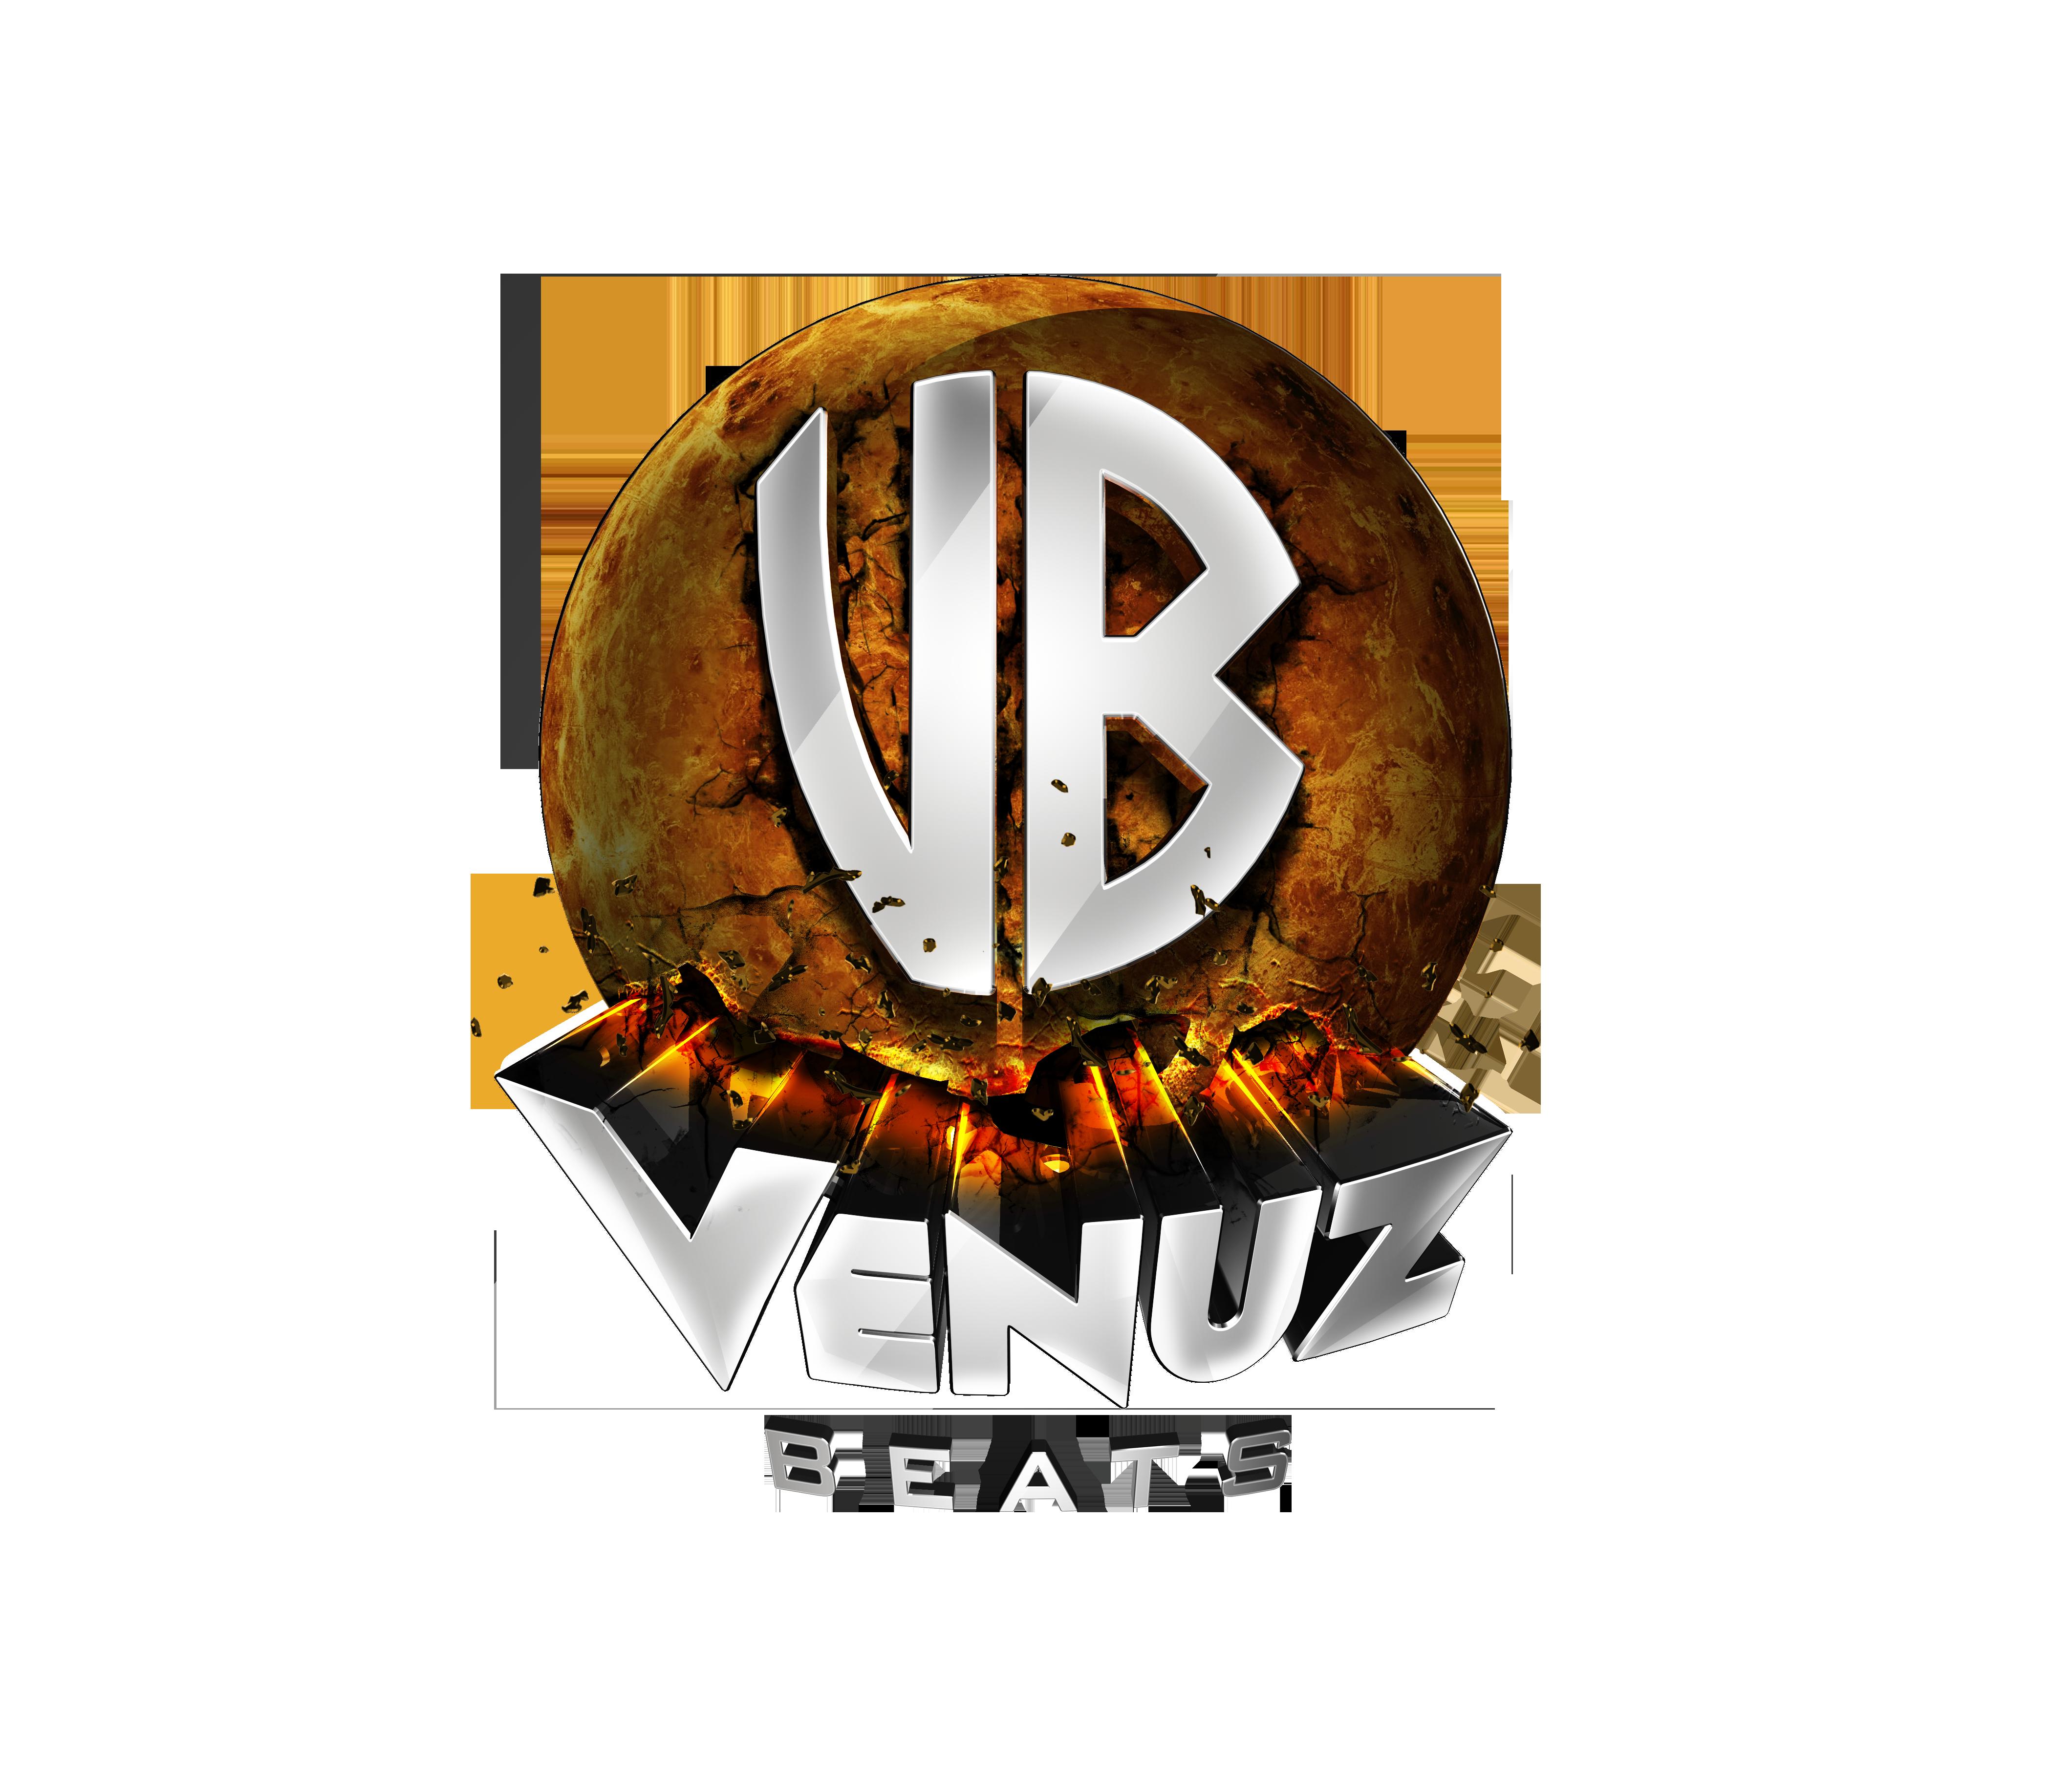 Venuz Beats - Neo Soul